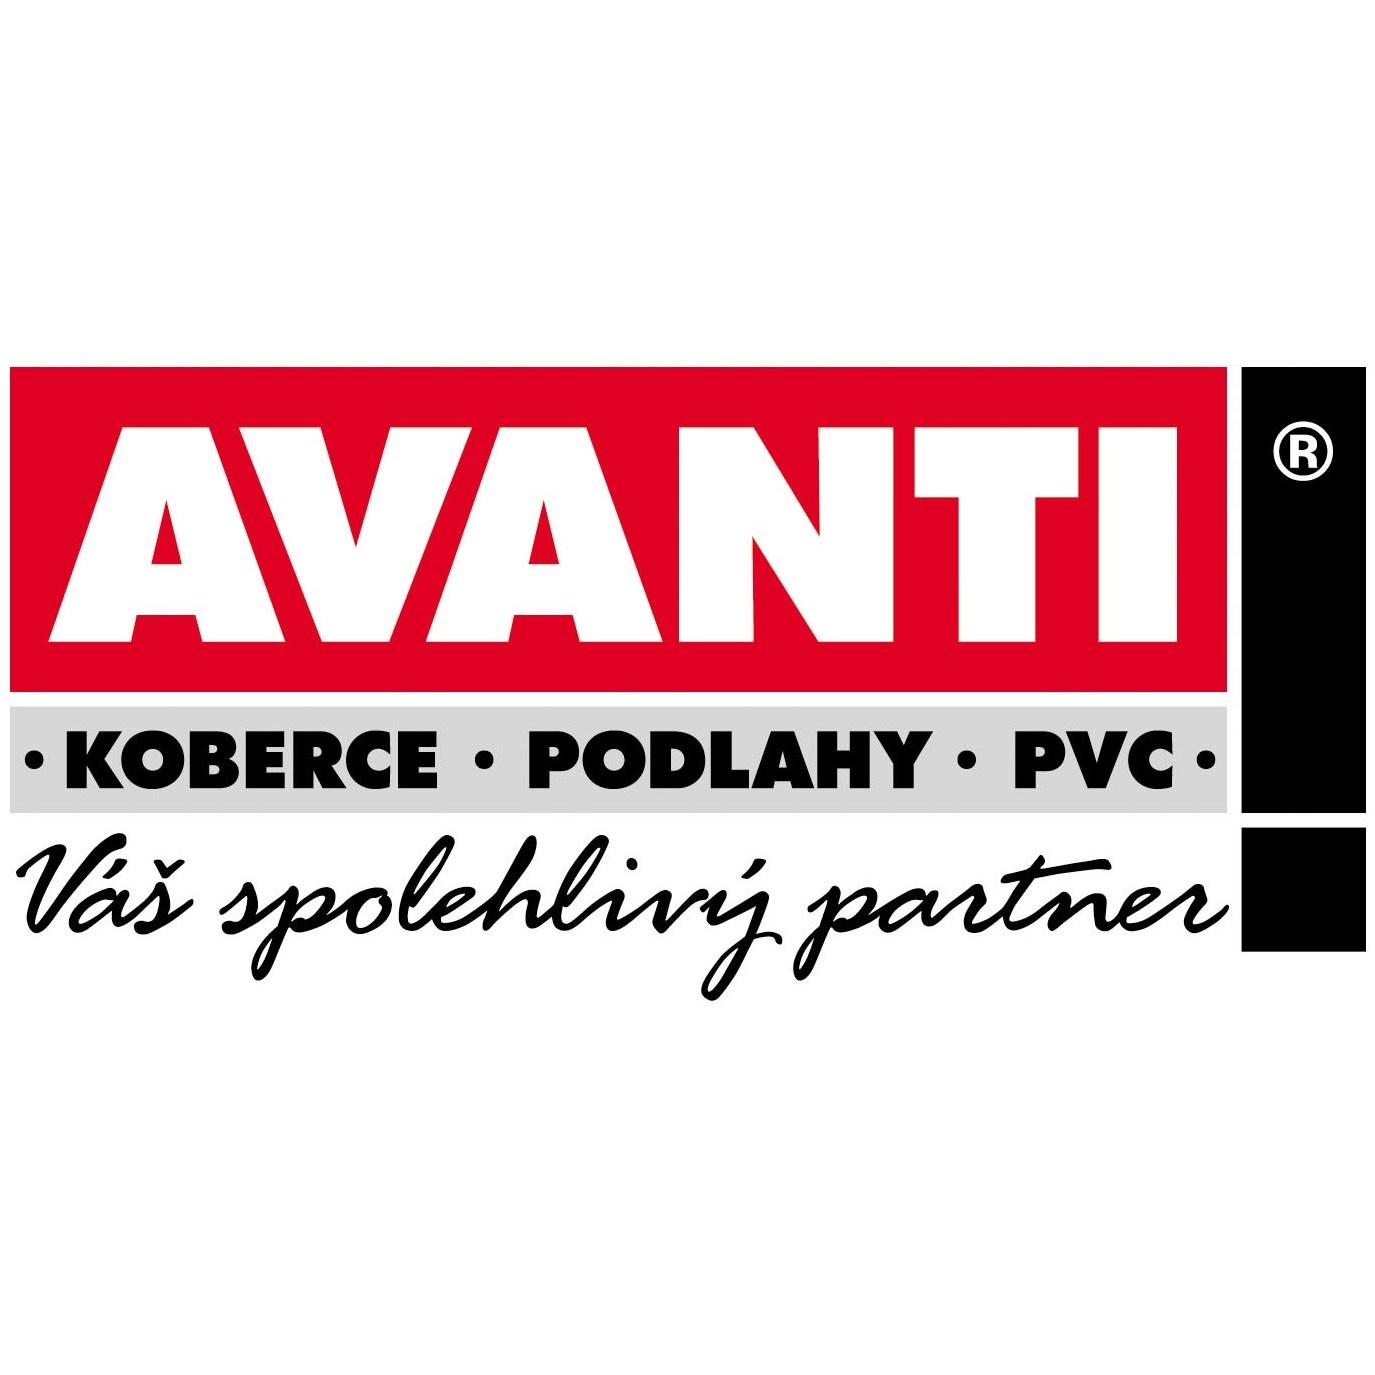 Avanti Floors s.r.o. – koberce a podlahy Černý Most